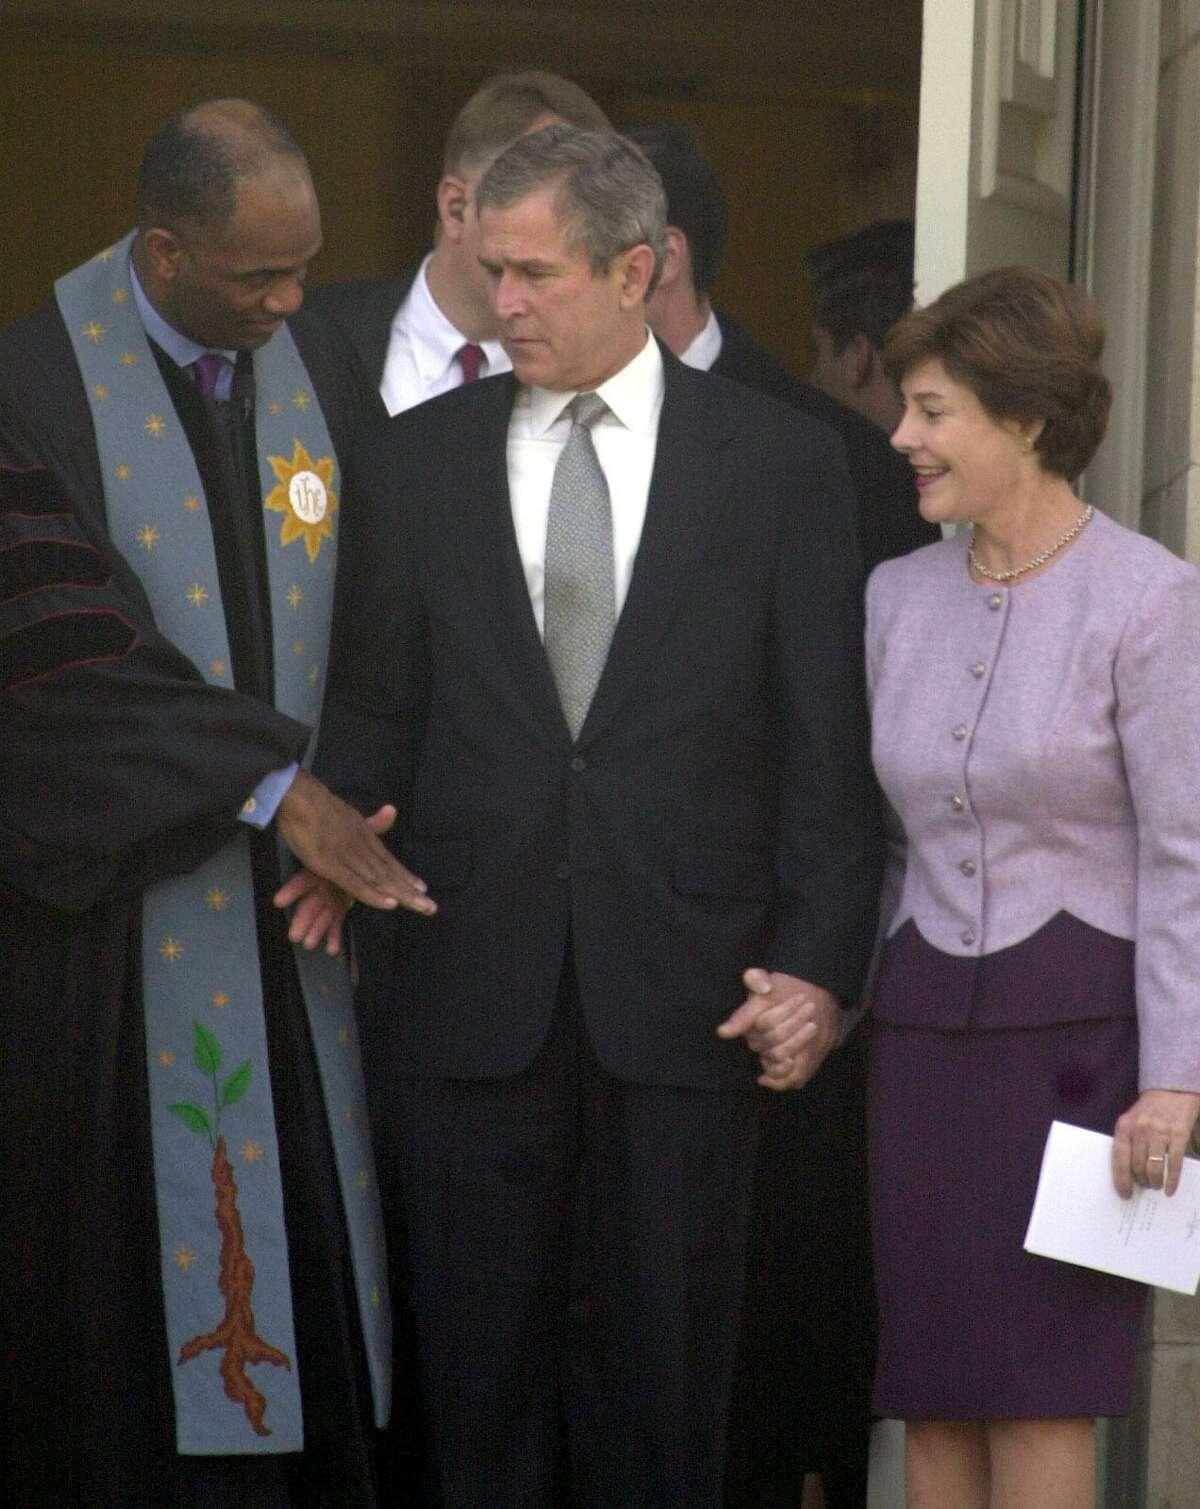 Windsor Village-St John's United Methodist Churches Pastor Kirbyjon H. Caldwell, of Houston, greets George W. Bush and Laura Bush after a prayer service at Tarrytown United Methodist Church Thursday, Dec. 14, 2000, in Austin.